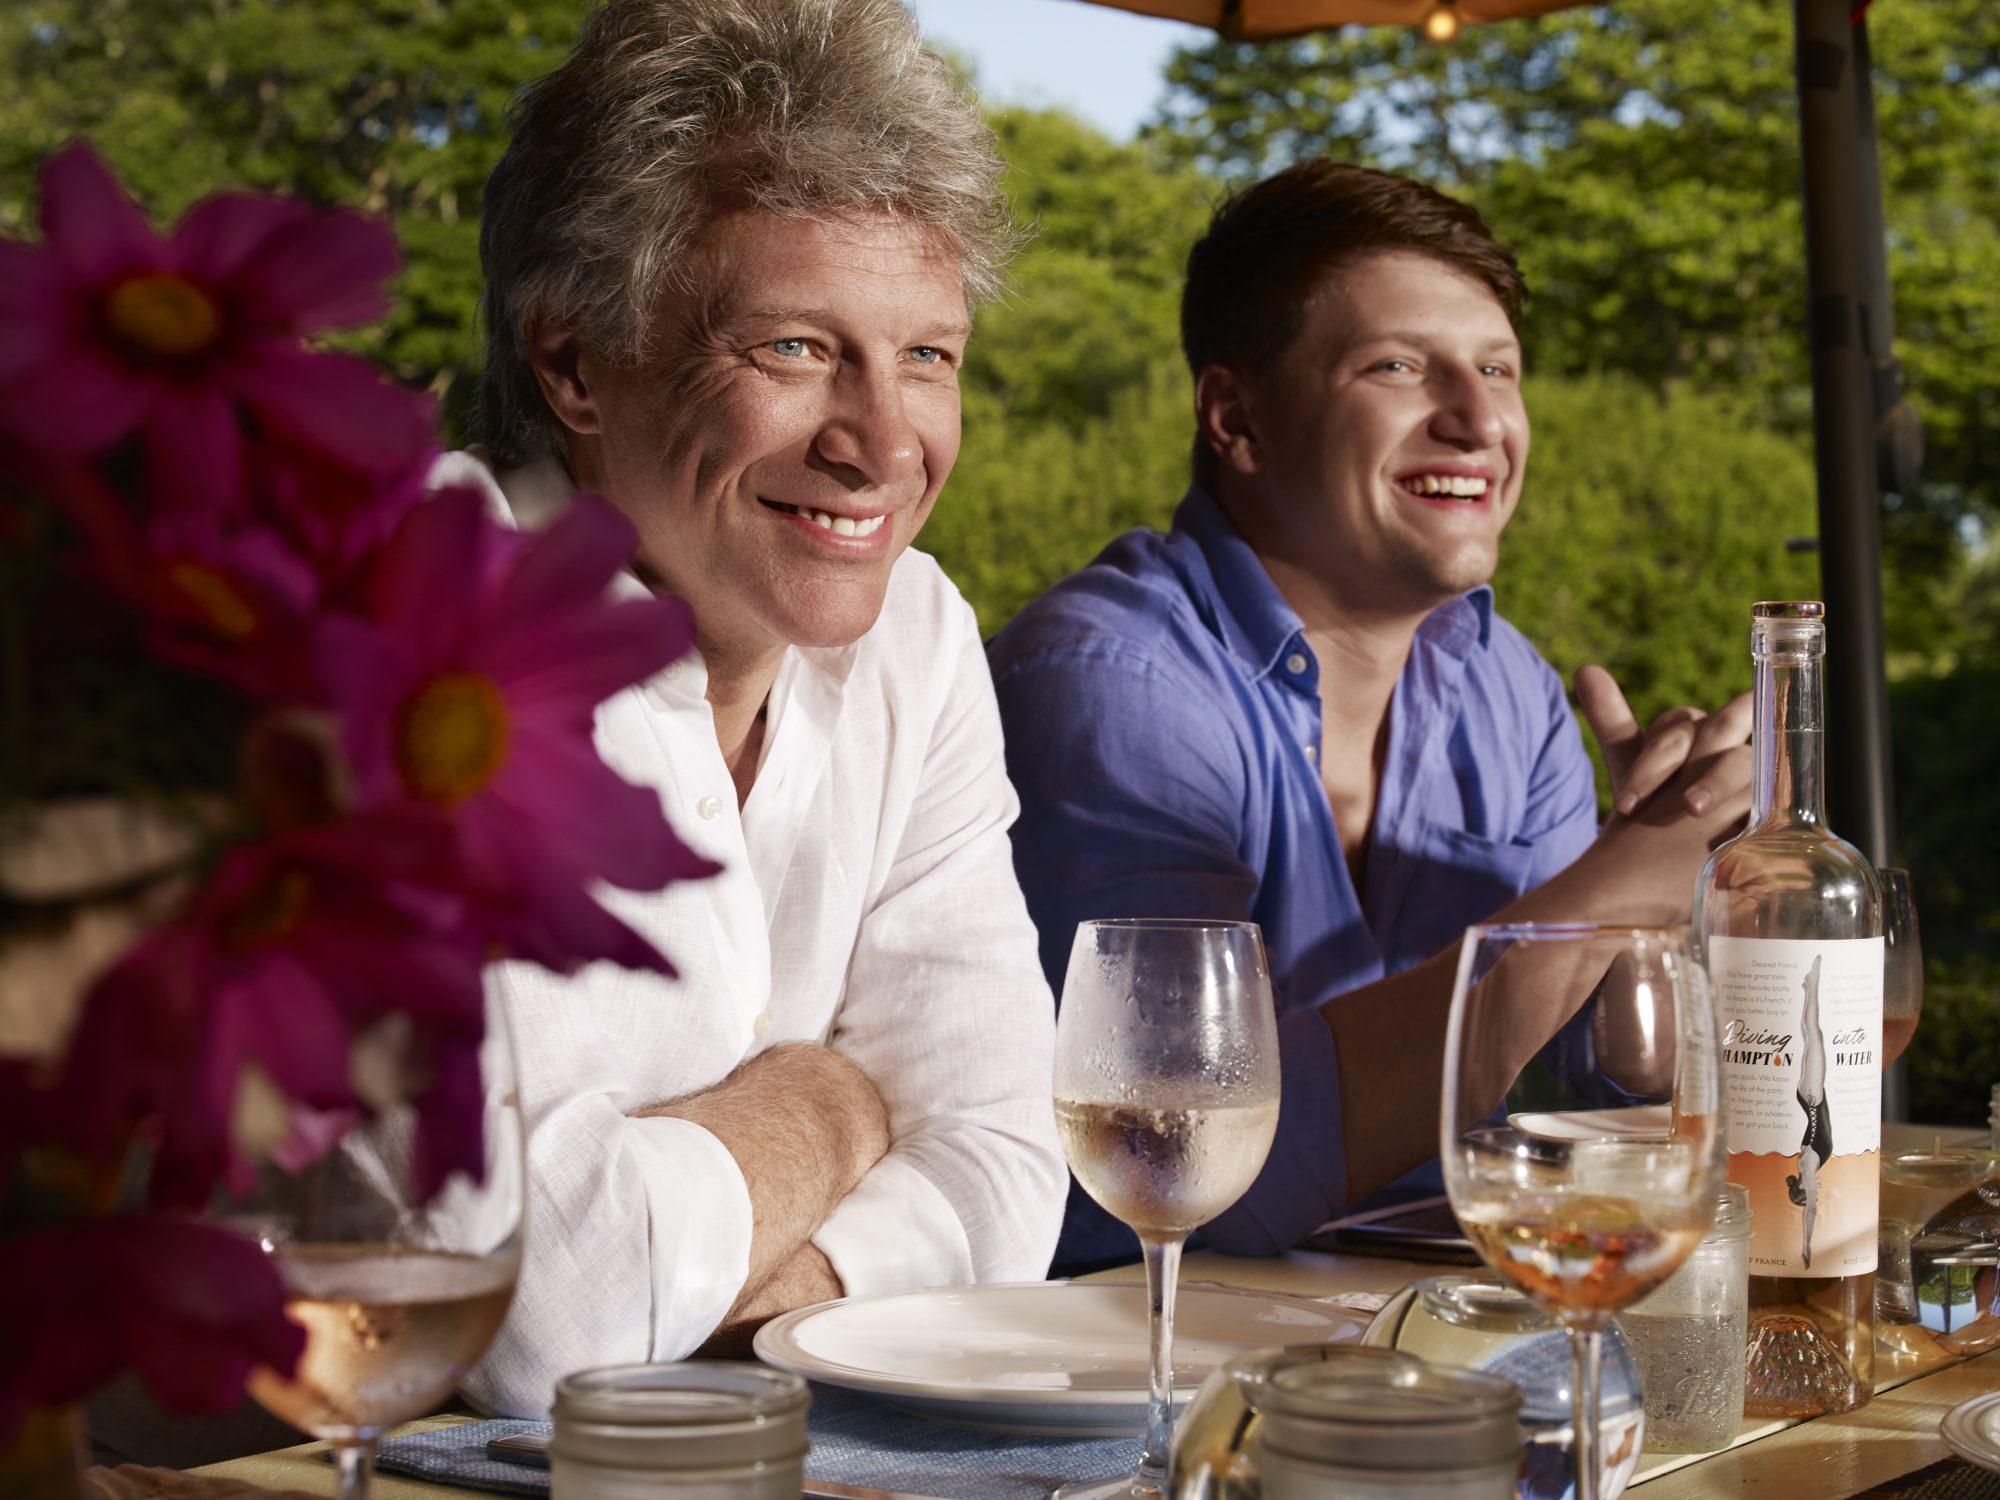 Jon Bon Jovi's Wine Was Just Named the Best Rosé of 2018